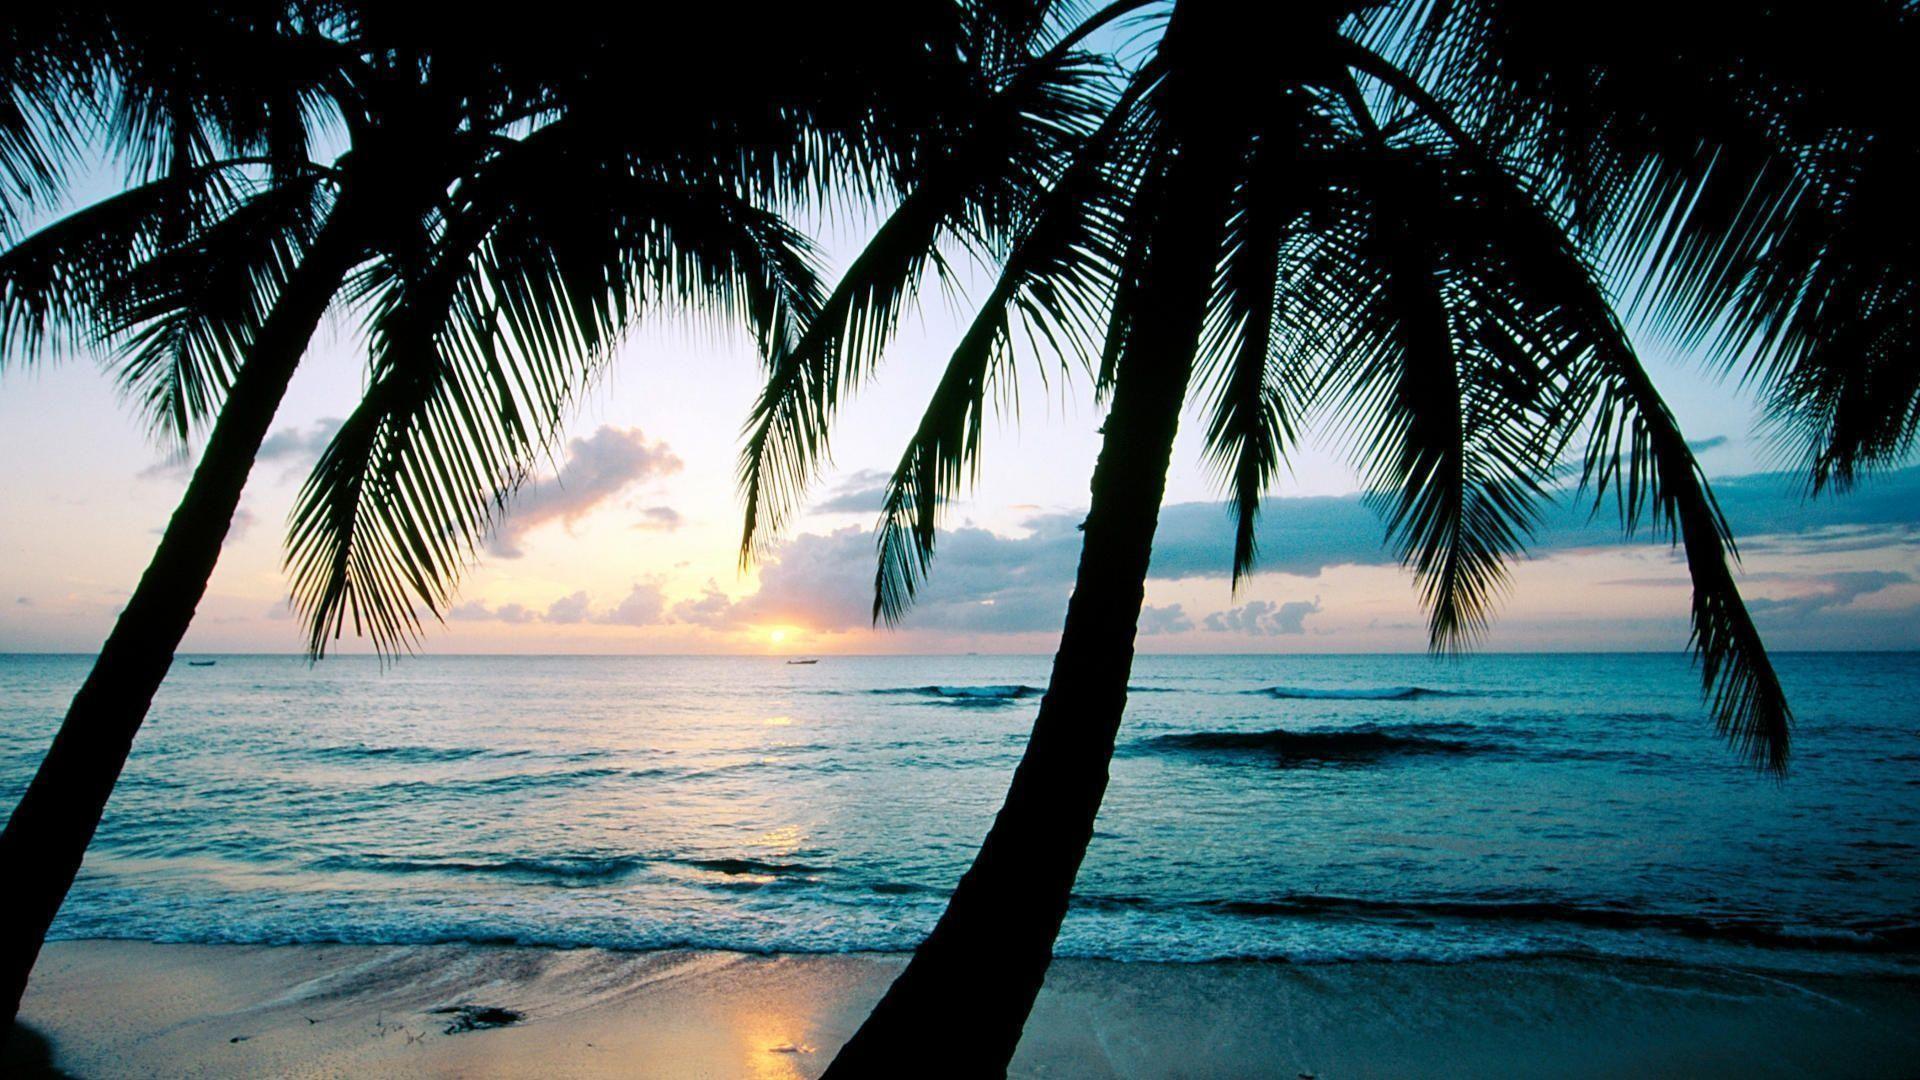 palm tree wallpaper desktop 69 images